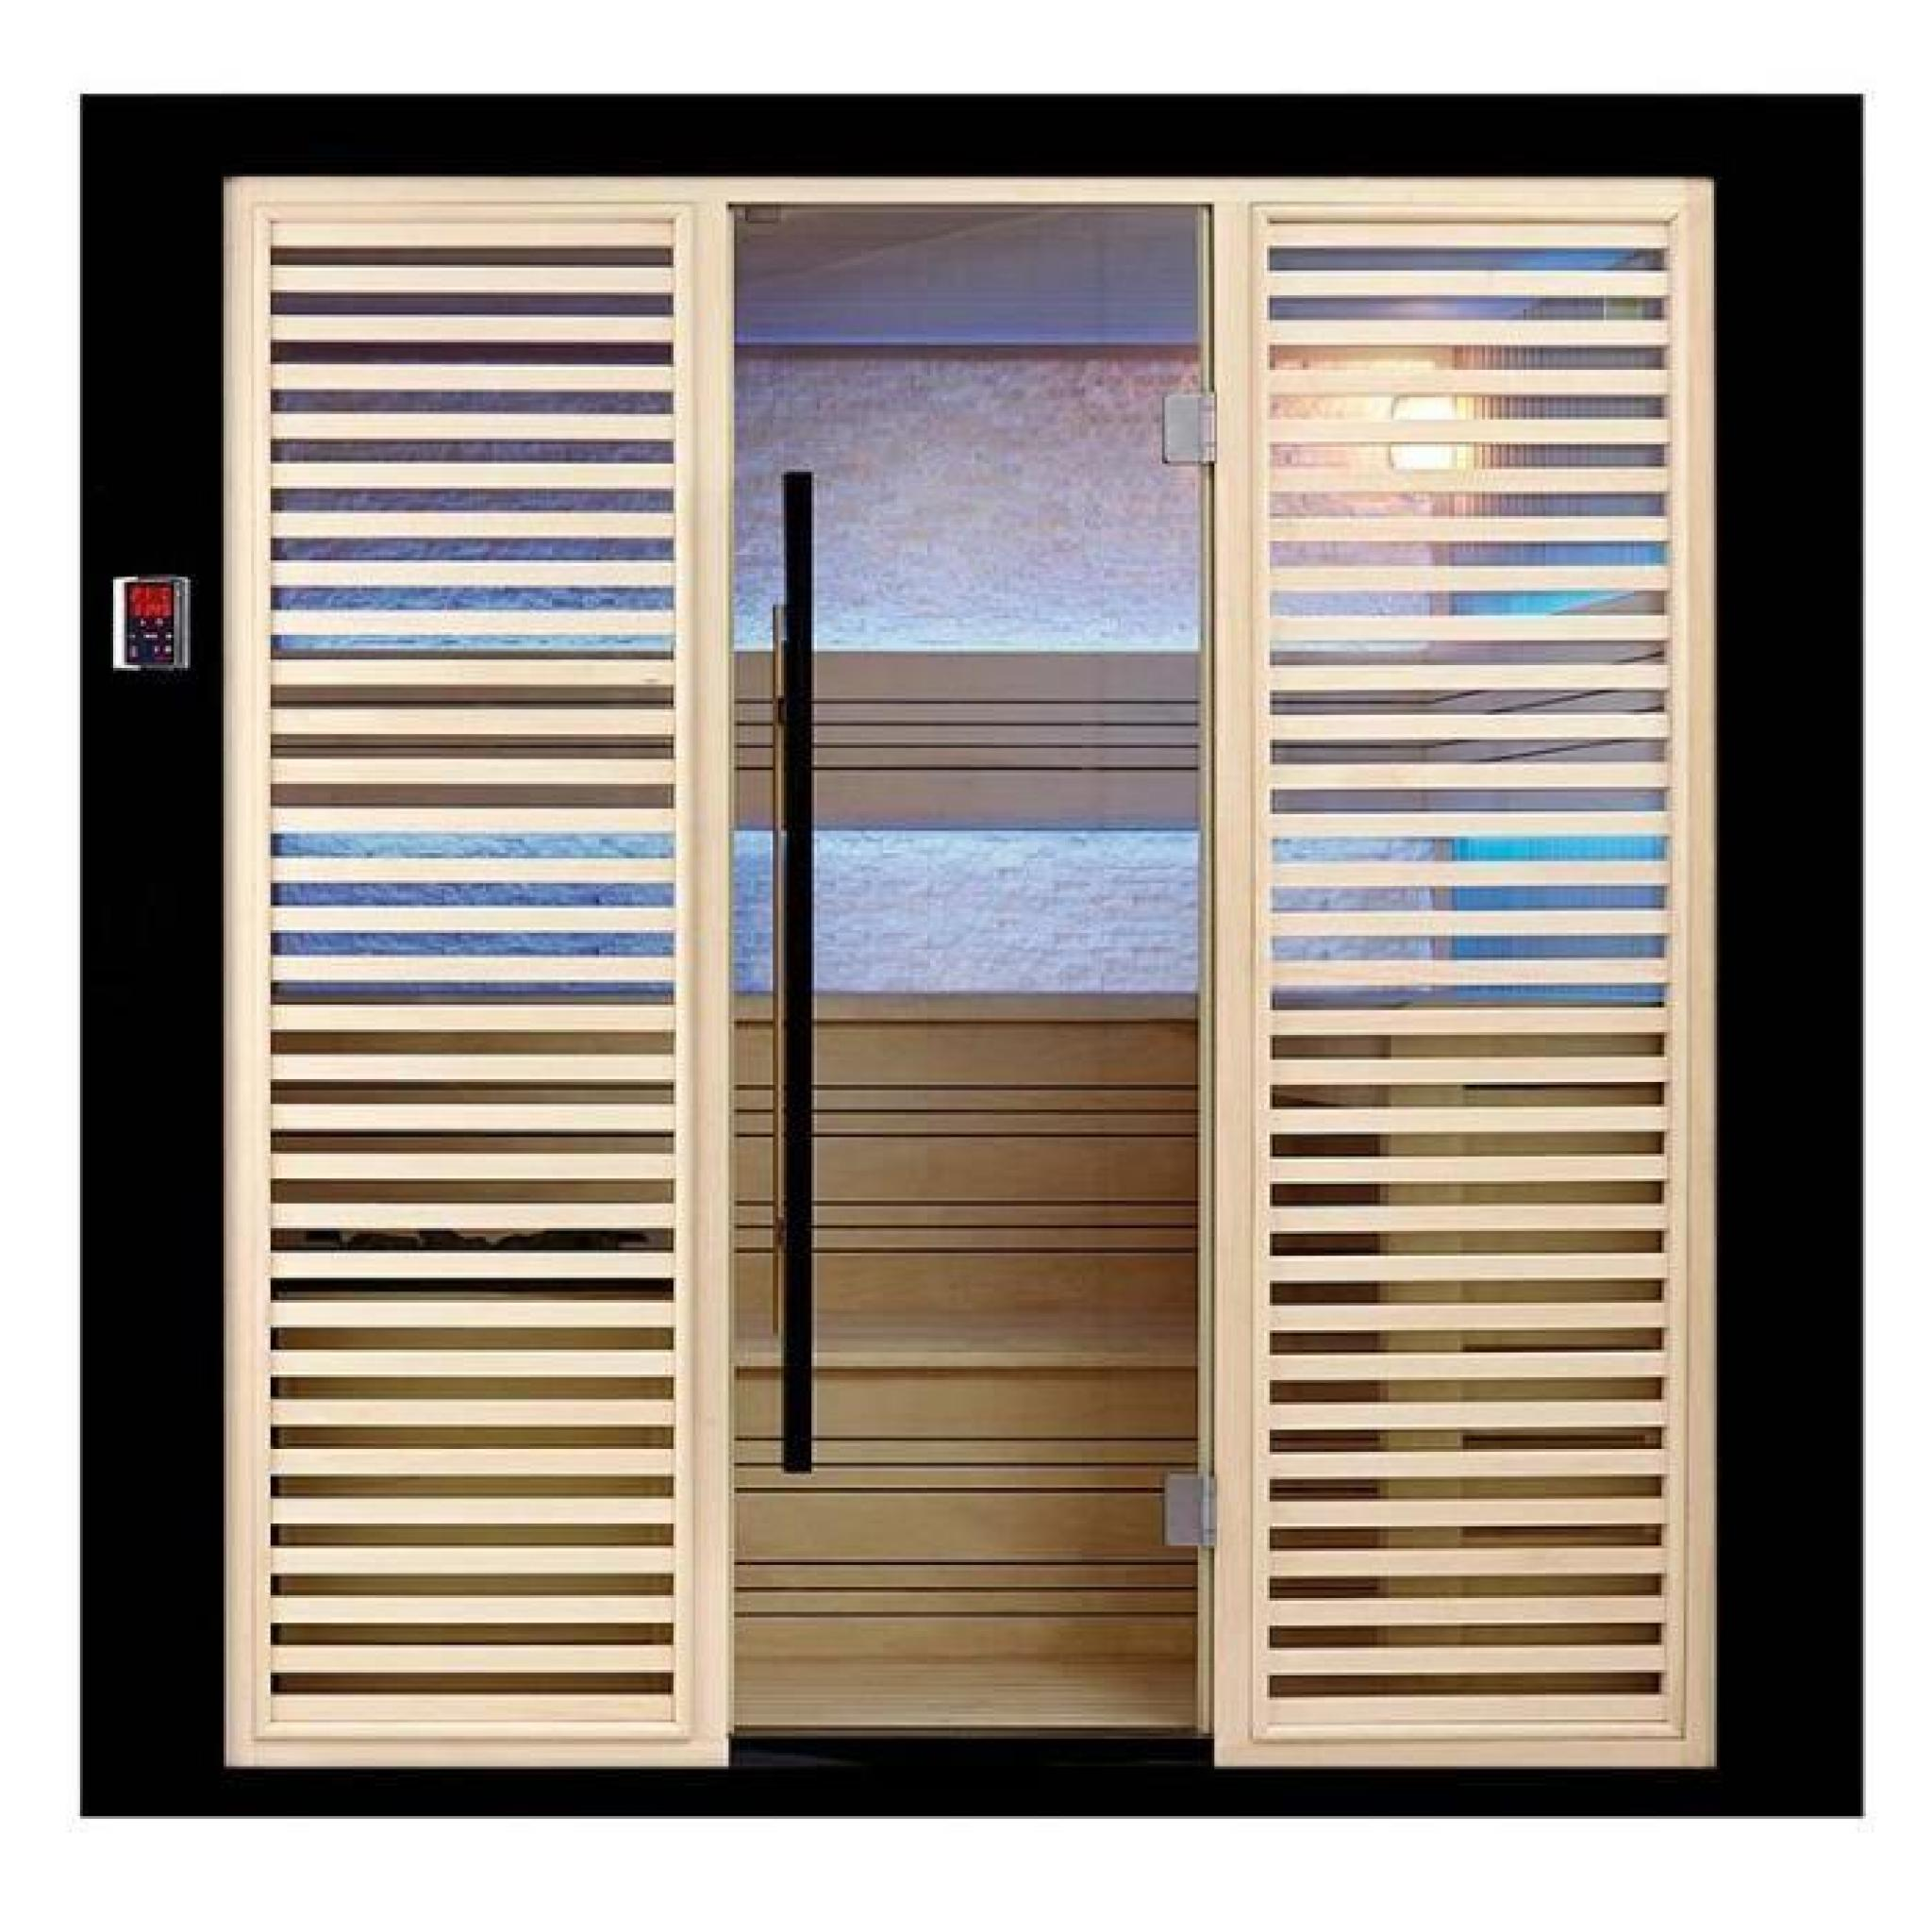 sauna traditionnels arizona 200 x 170 x 210 pin blanc achat vente sauna pas cher. Black Bedroom Furniture Sets. Home Design Ideas